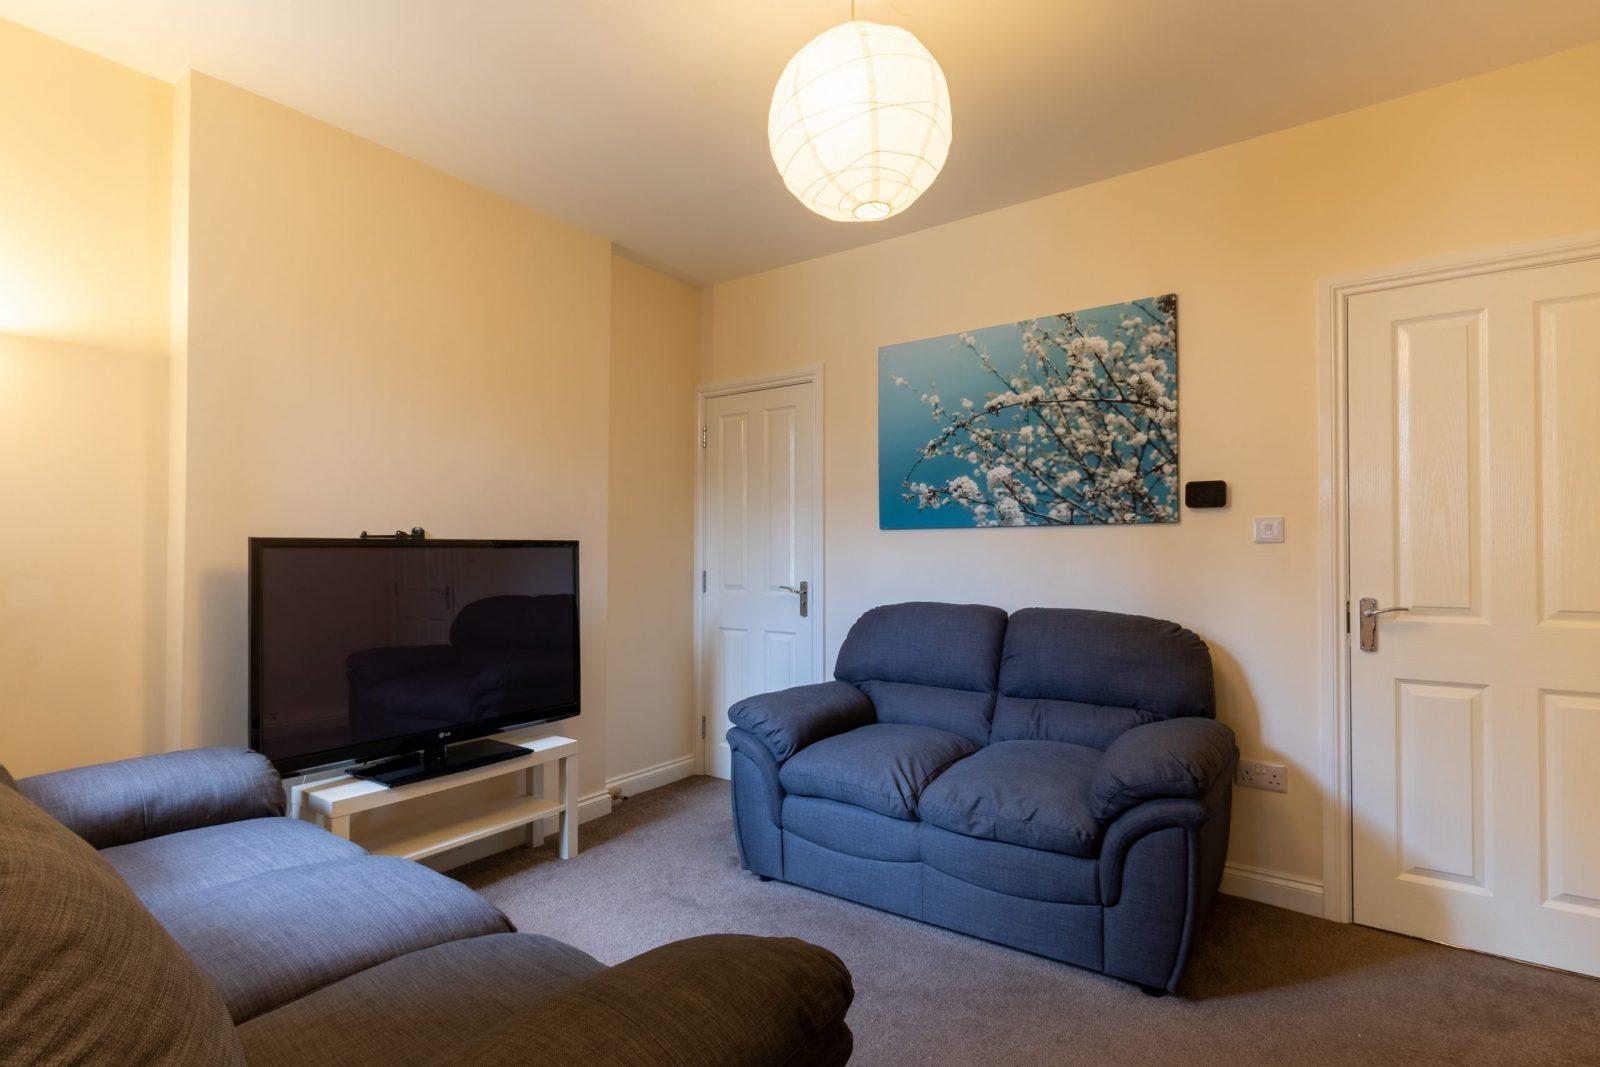 83 Balmoral Road Lancaster Student Accommodation